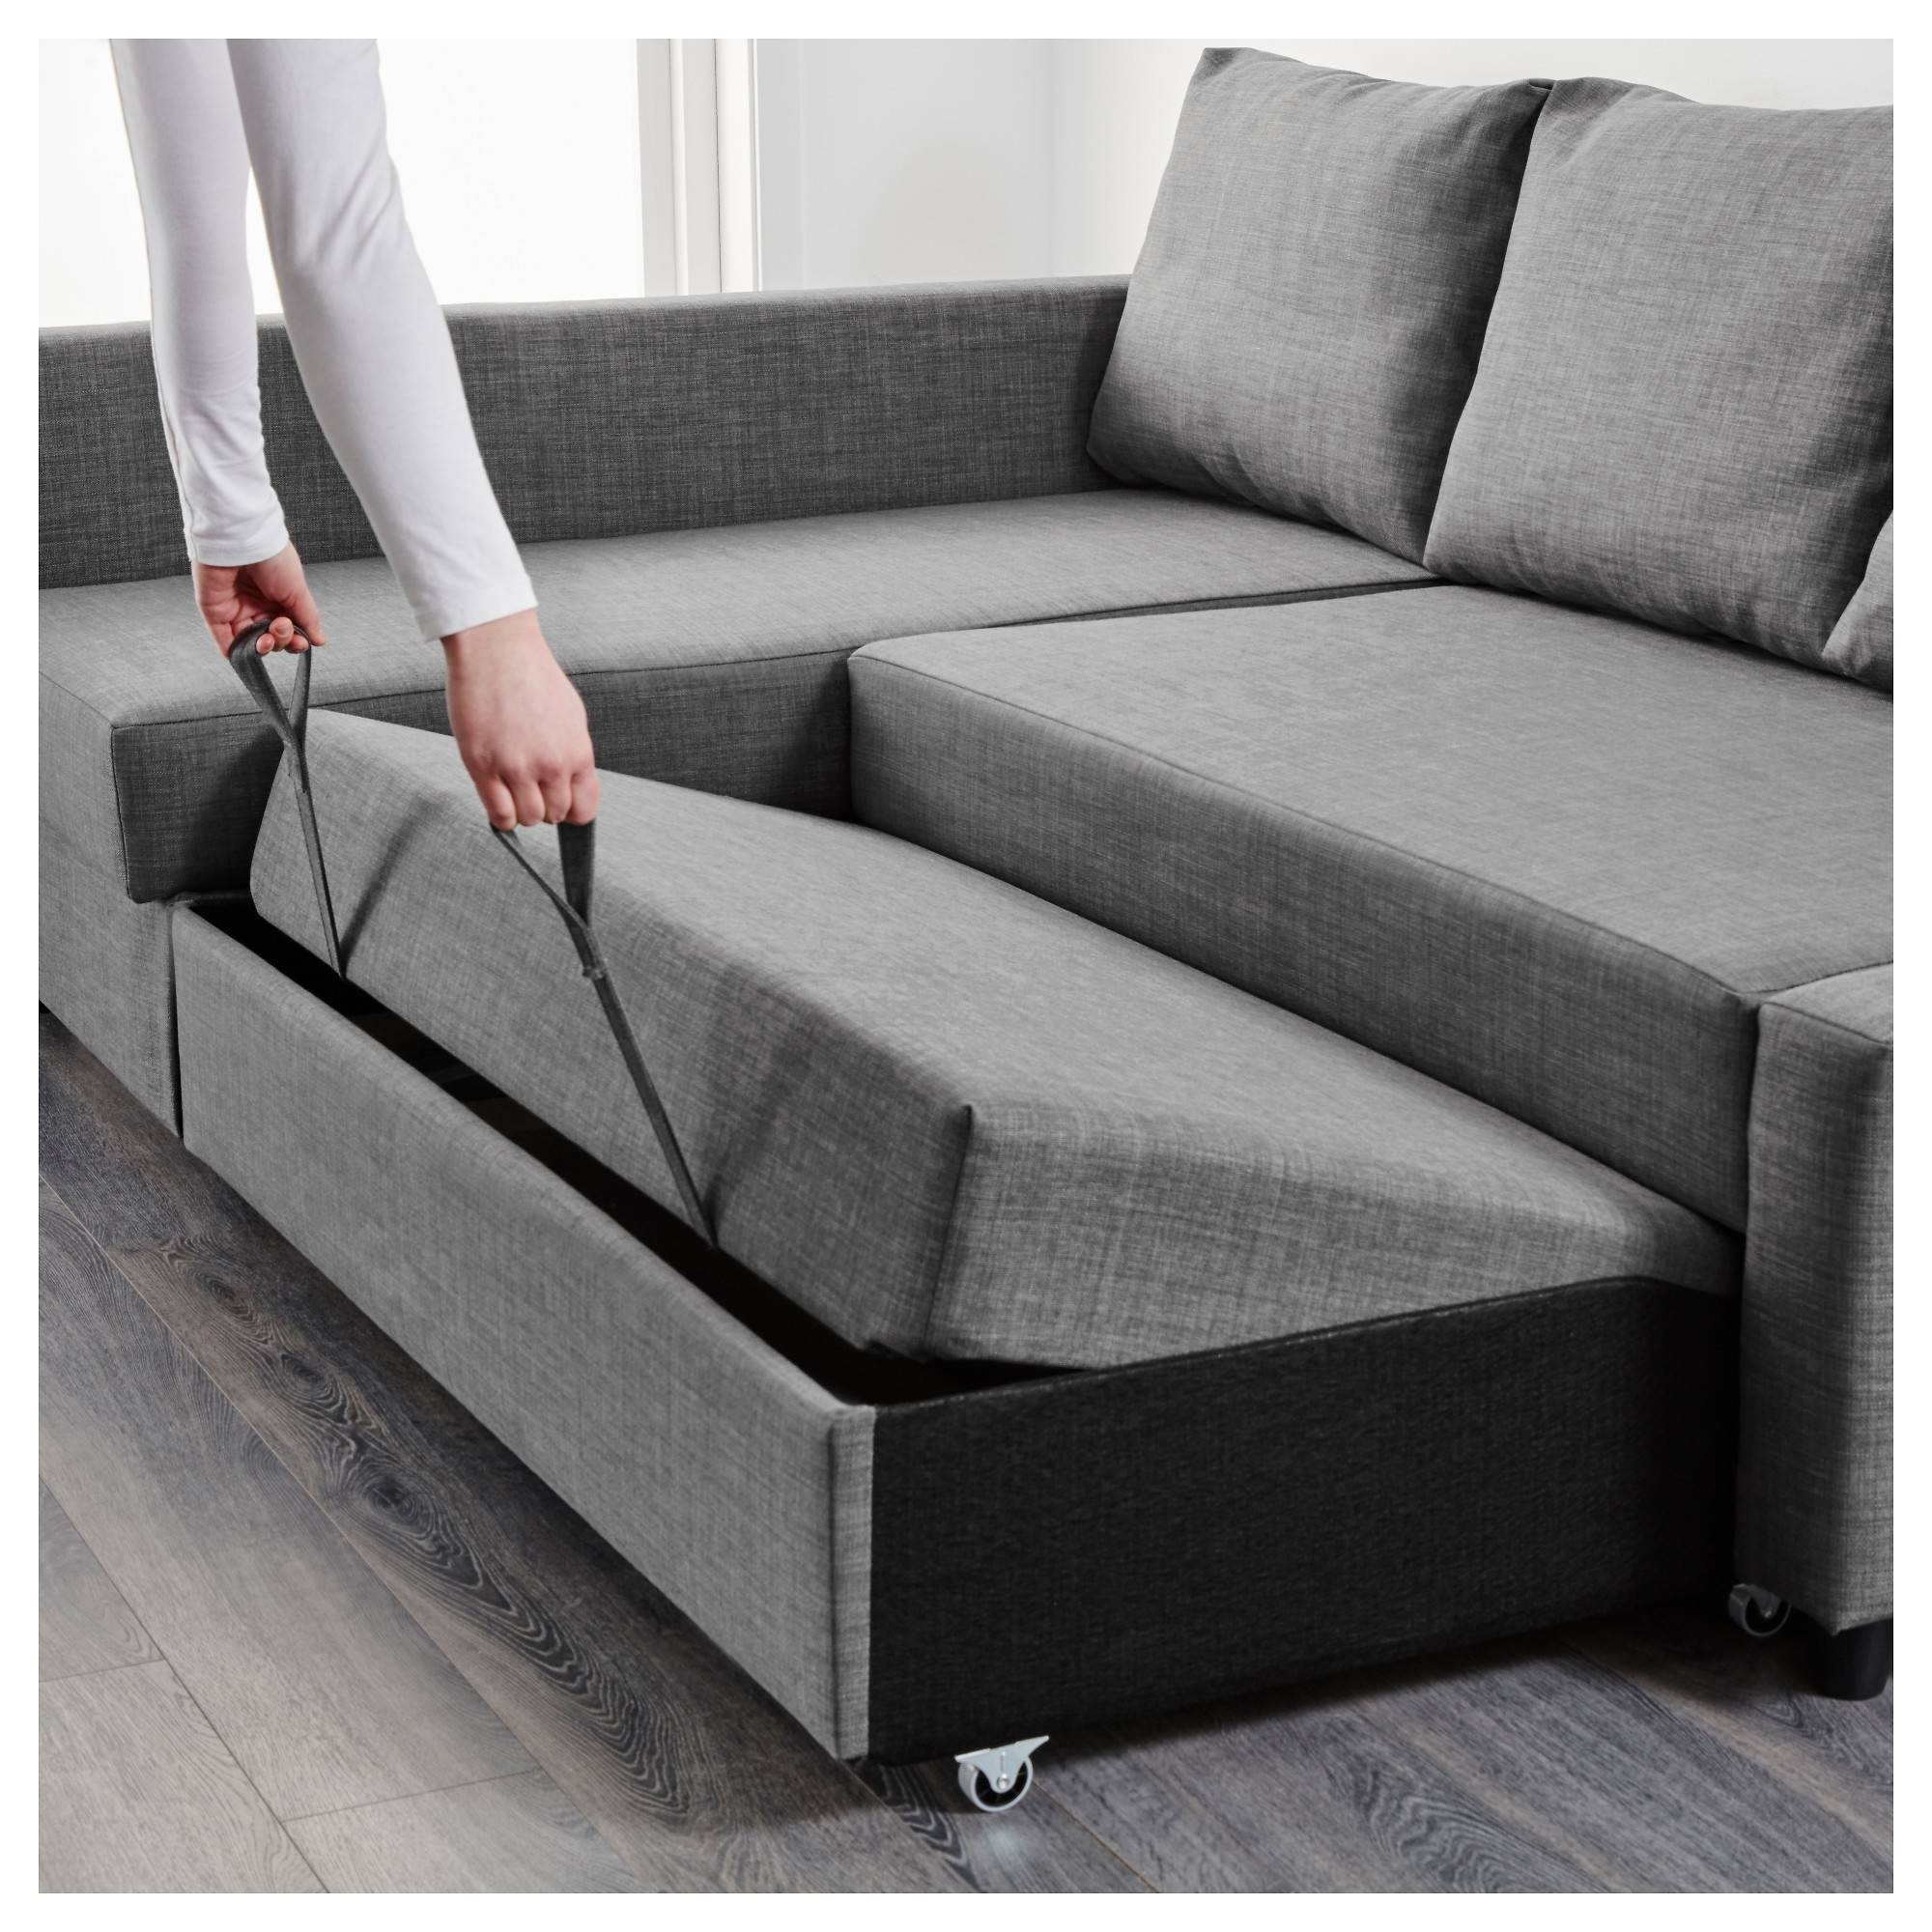 Friheten Corner Sofa-Bed With Storage Skiftebo Dark Grey - Ikea in Storage Sofa Ikea (Image 7 of 25)